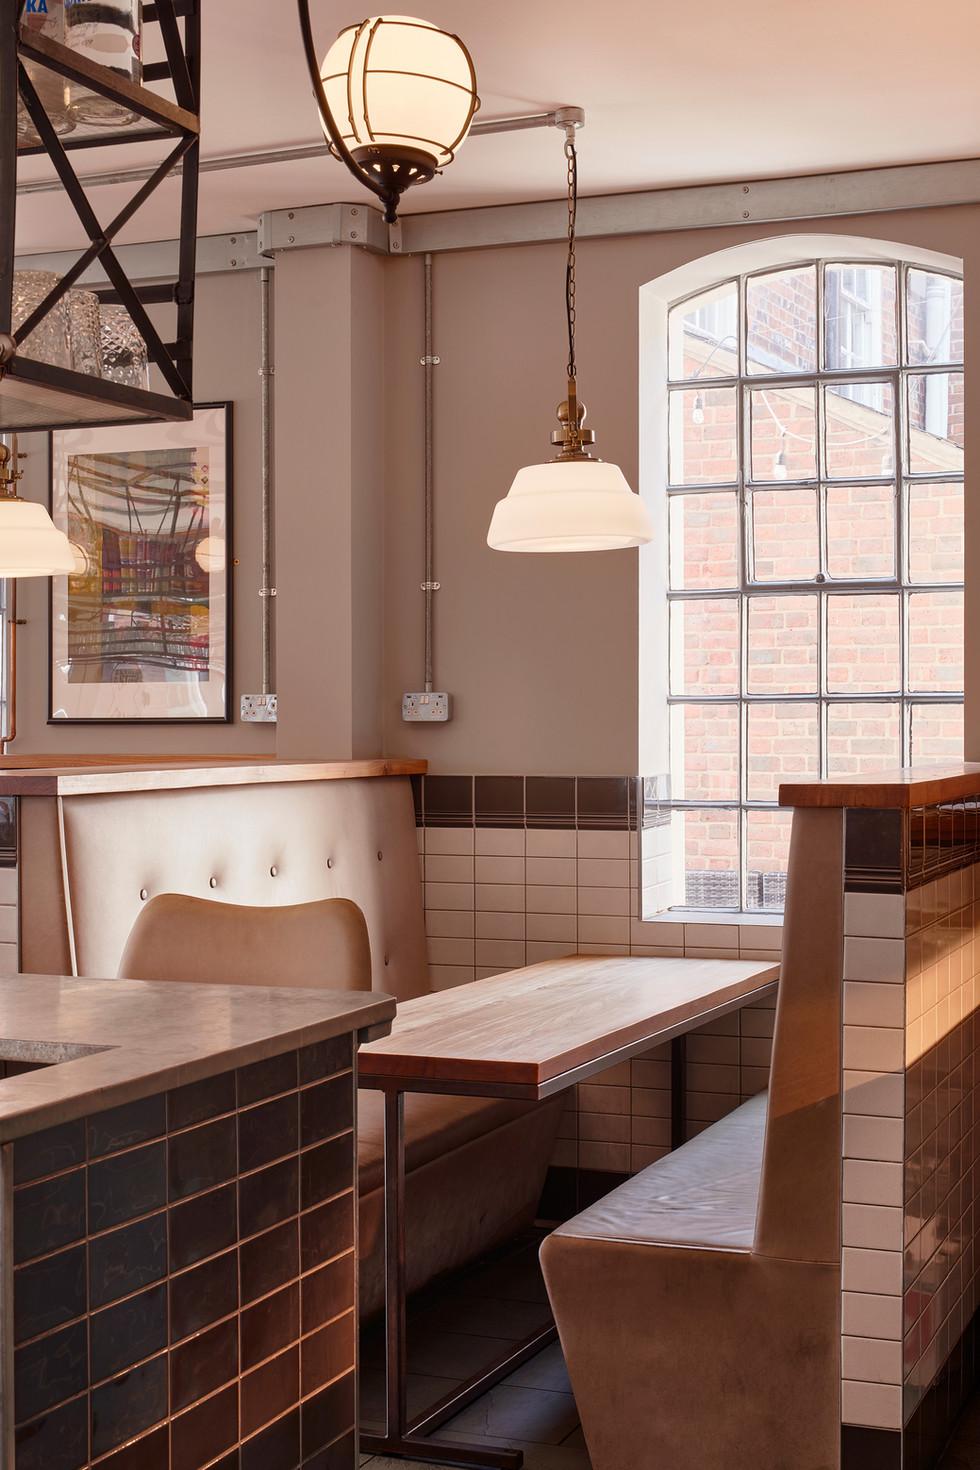 Heidrun-Gallery-Restaurant-shot2.jpg